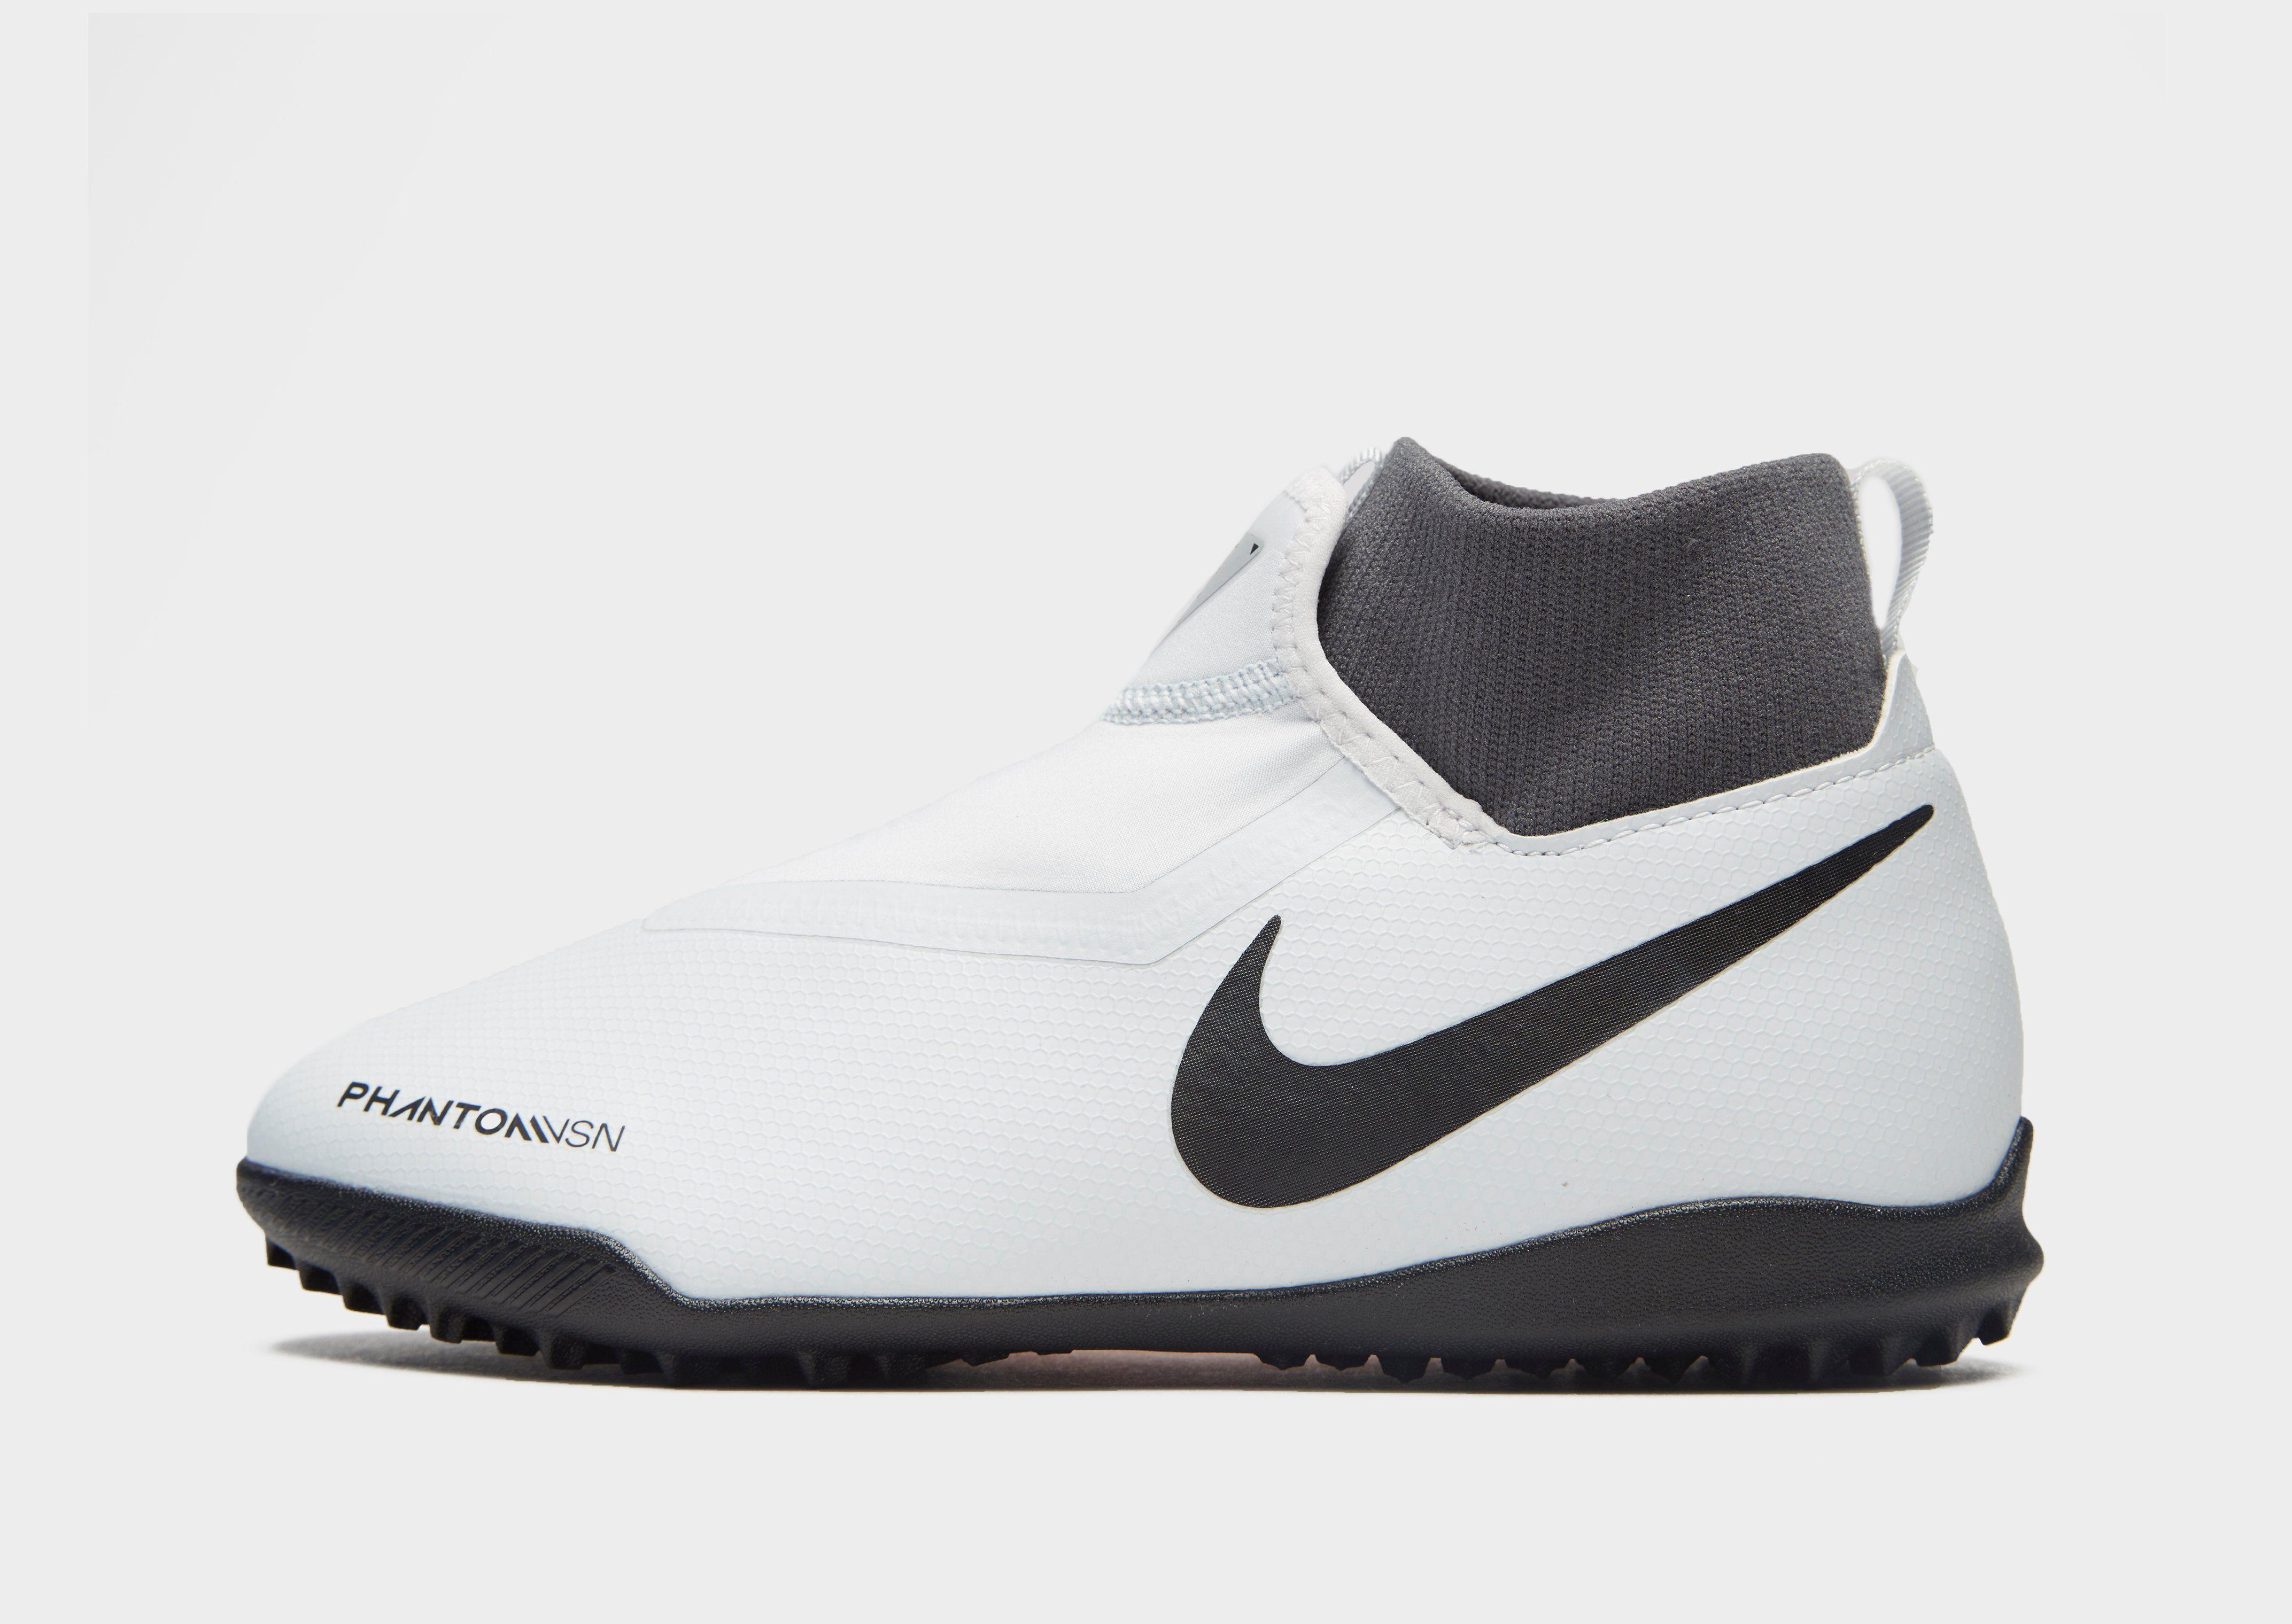 89b129252 NIKE Nike Jr. Phantom Vision Academy Dynamic Fit Younger Older Kids  Turf  Football Shoe